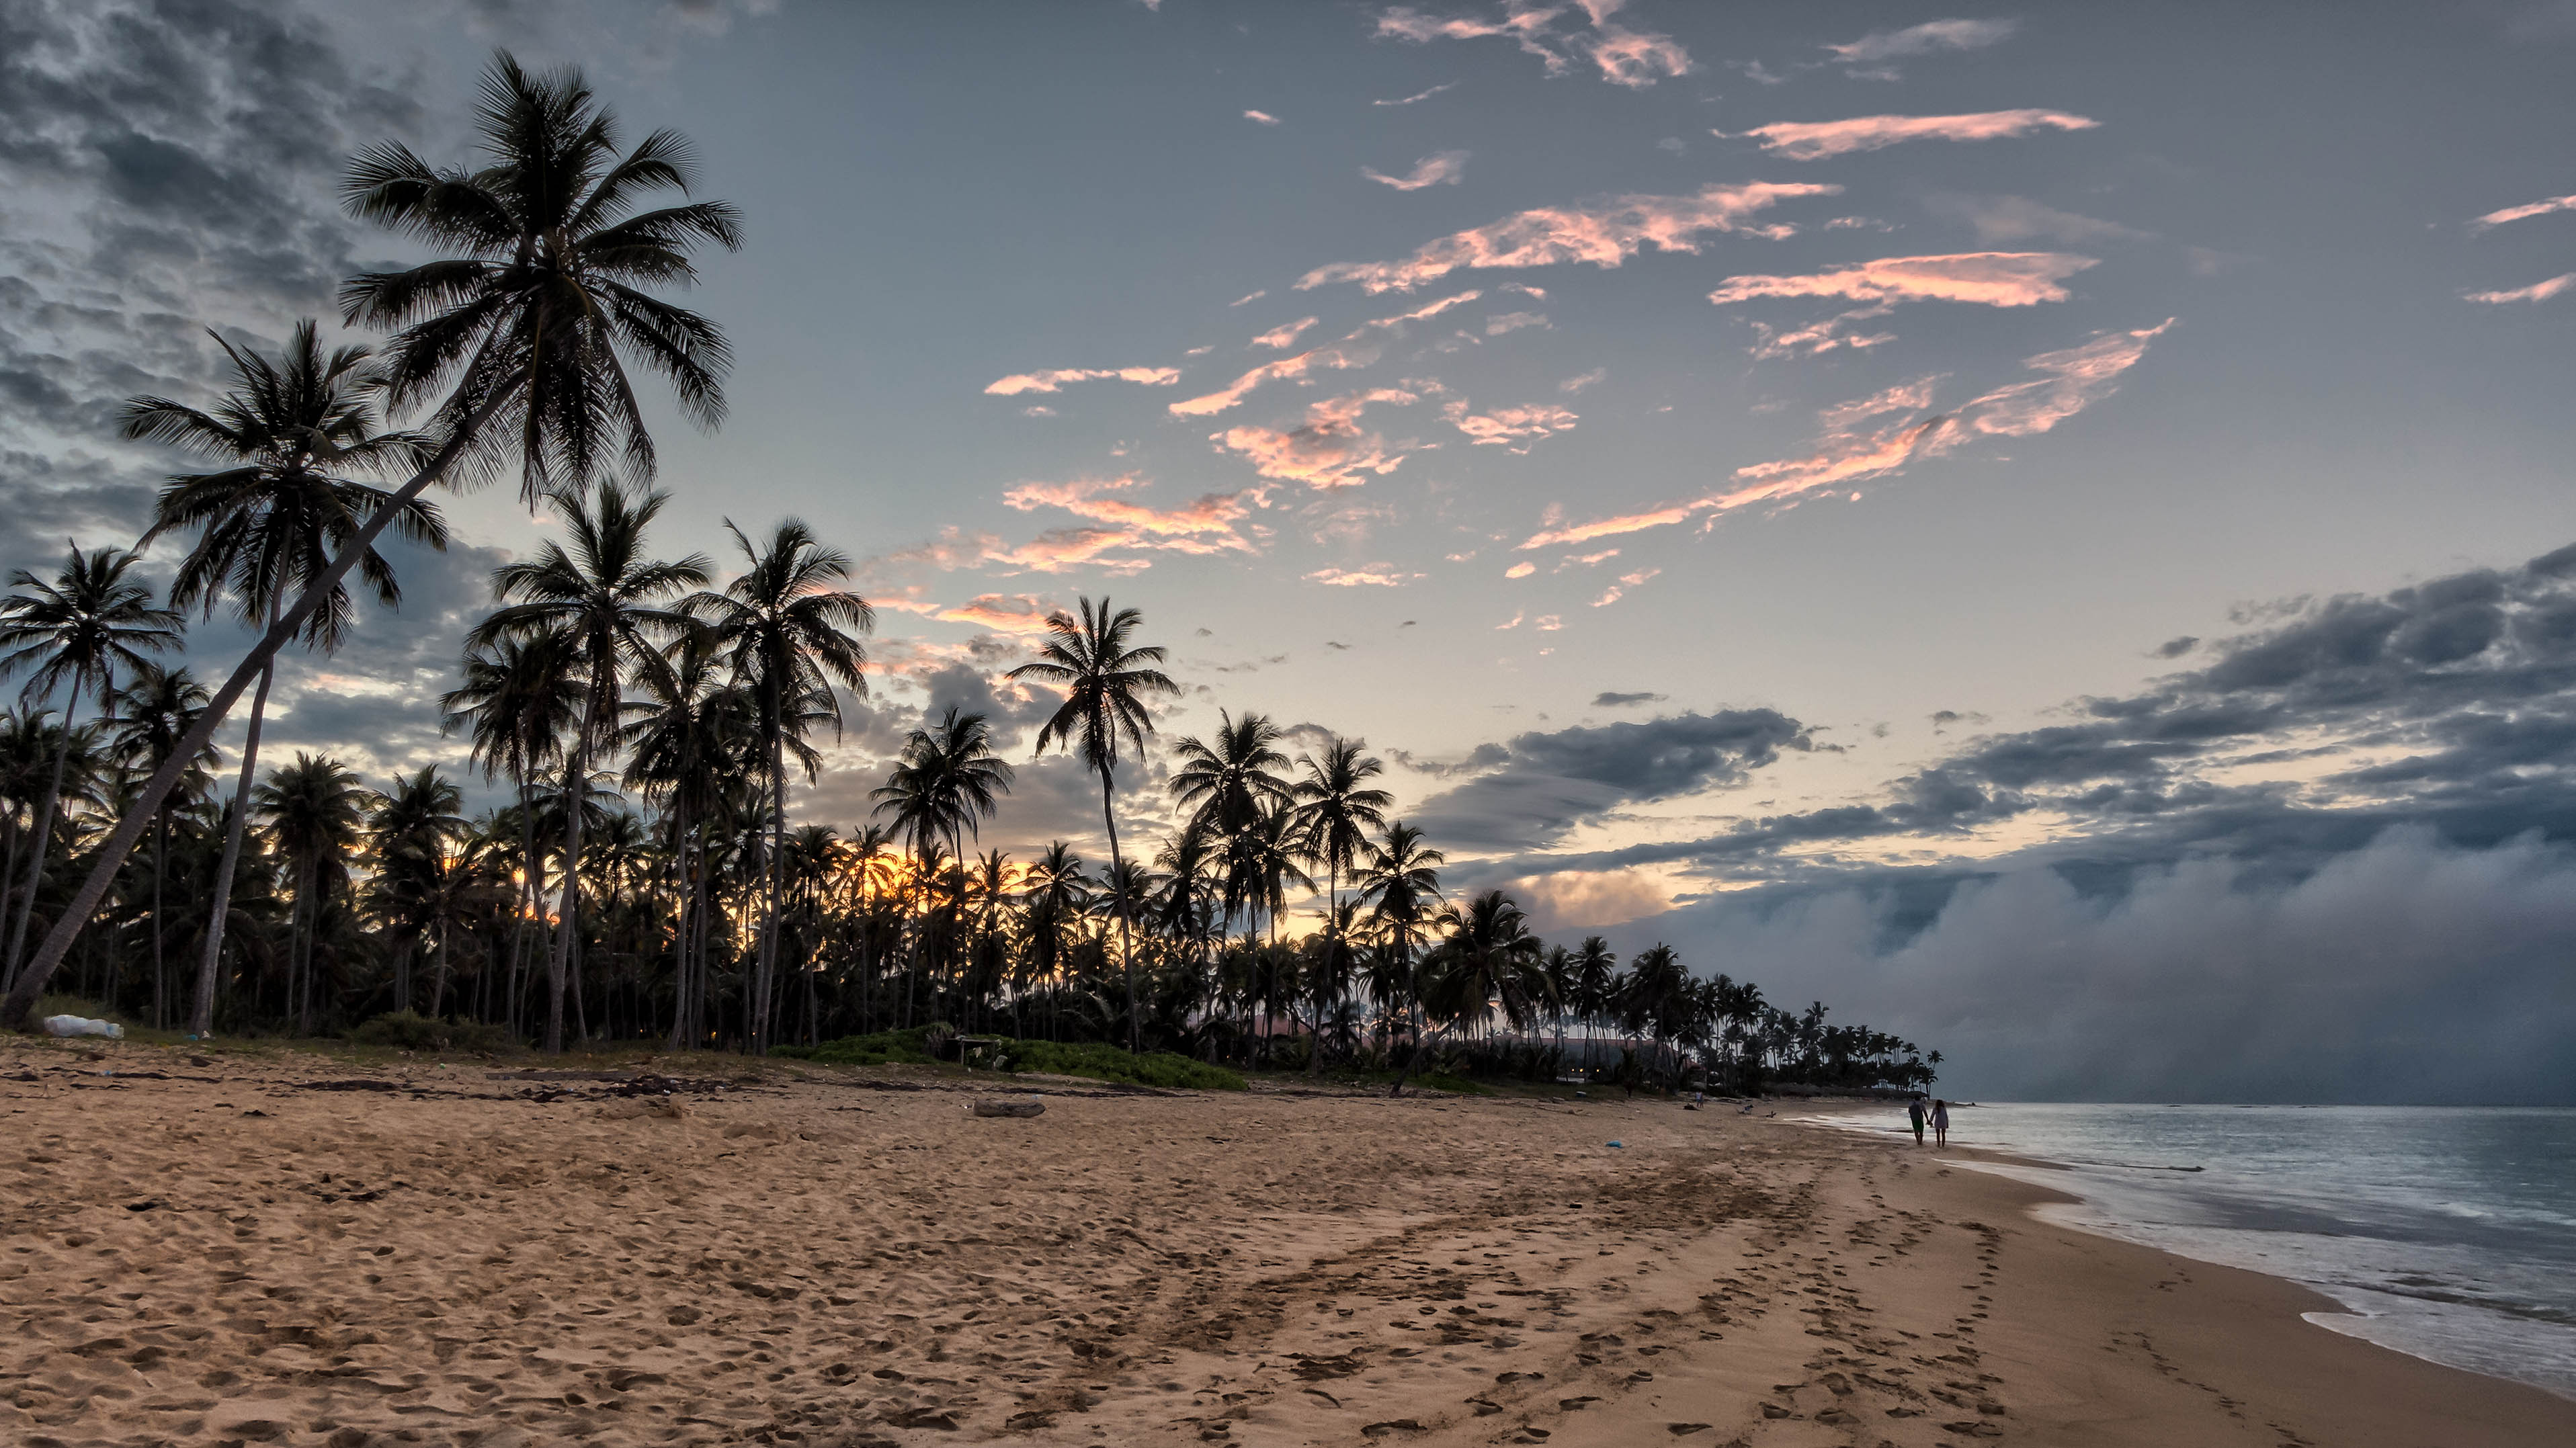 Sunset on the beach, Panasonic, Panasonic lumix dmc-lx7, Palm, Outdoor, HQ Photo